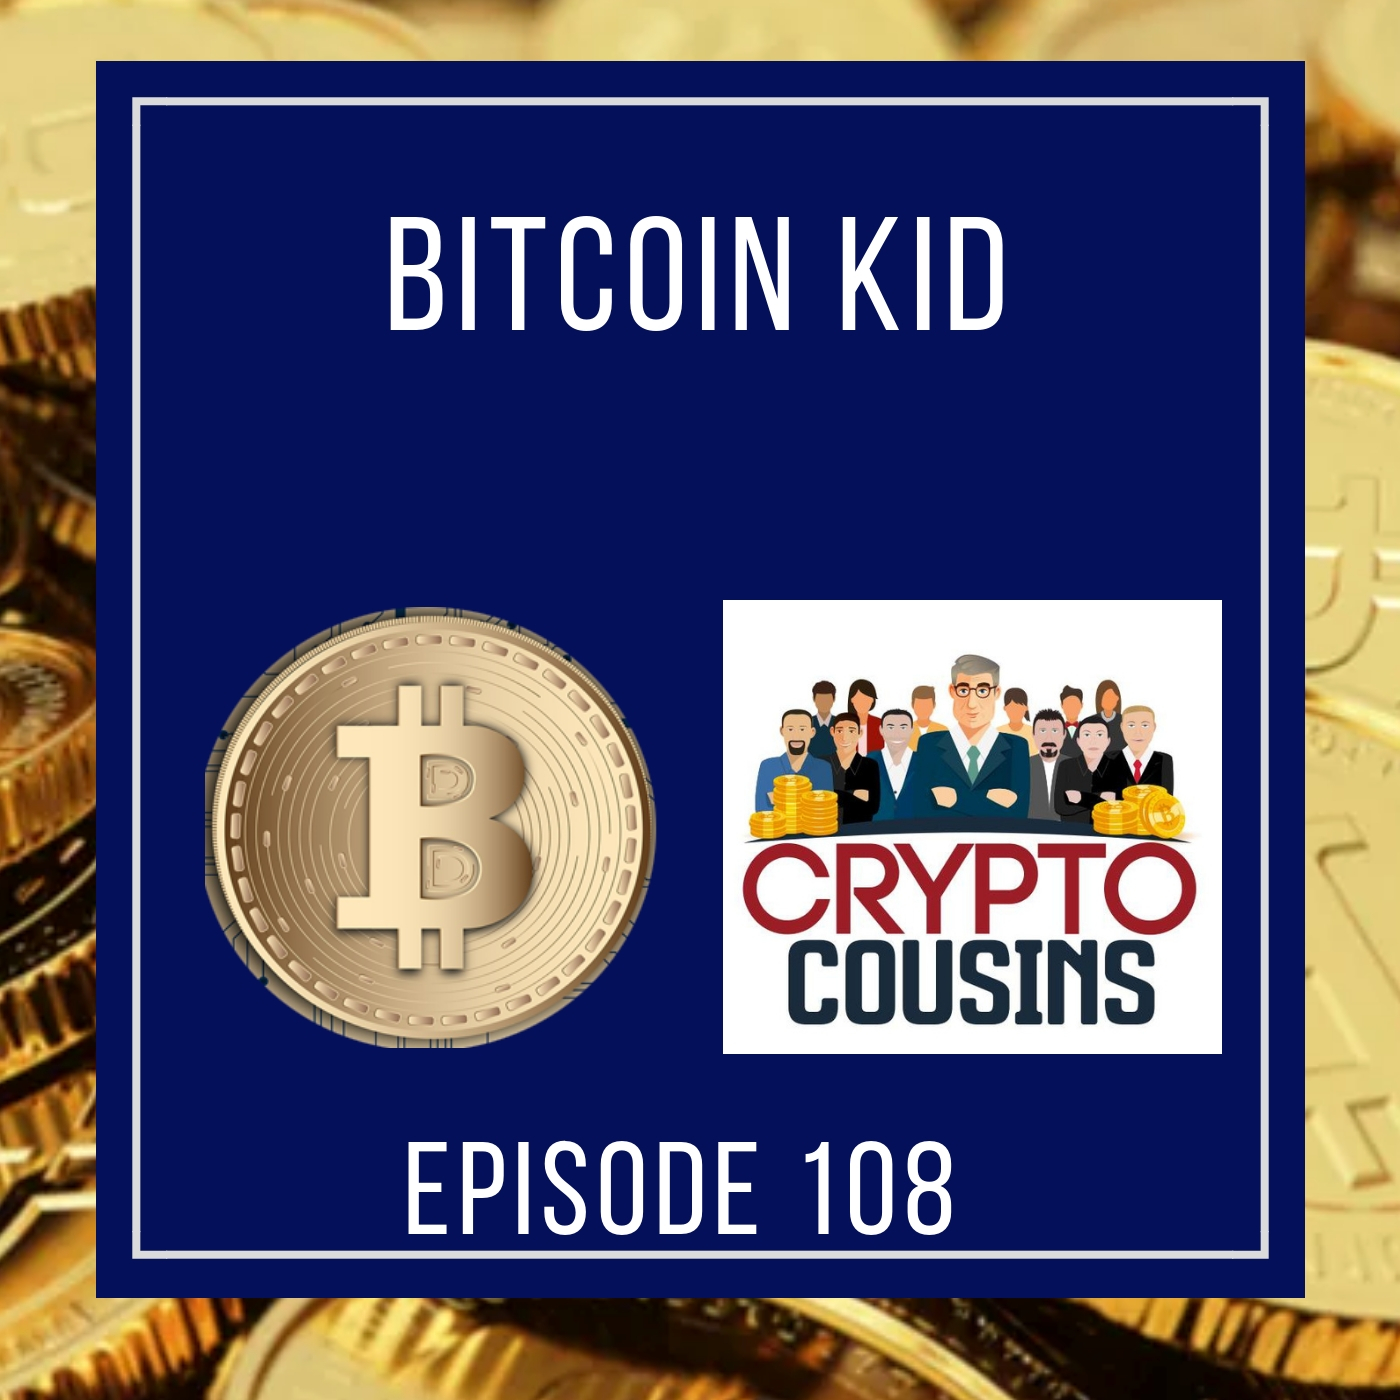 The Bitcoin Kid